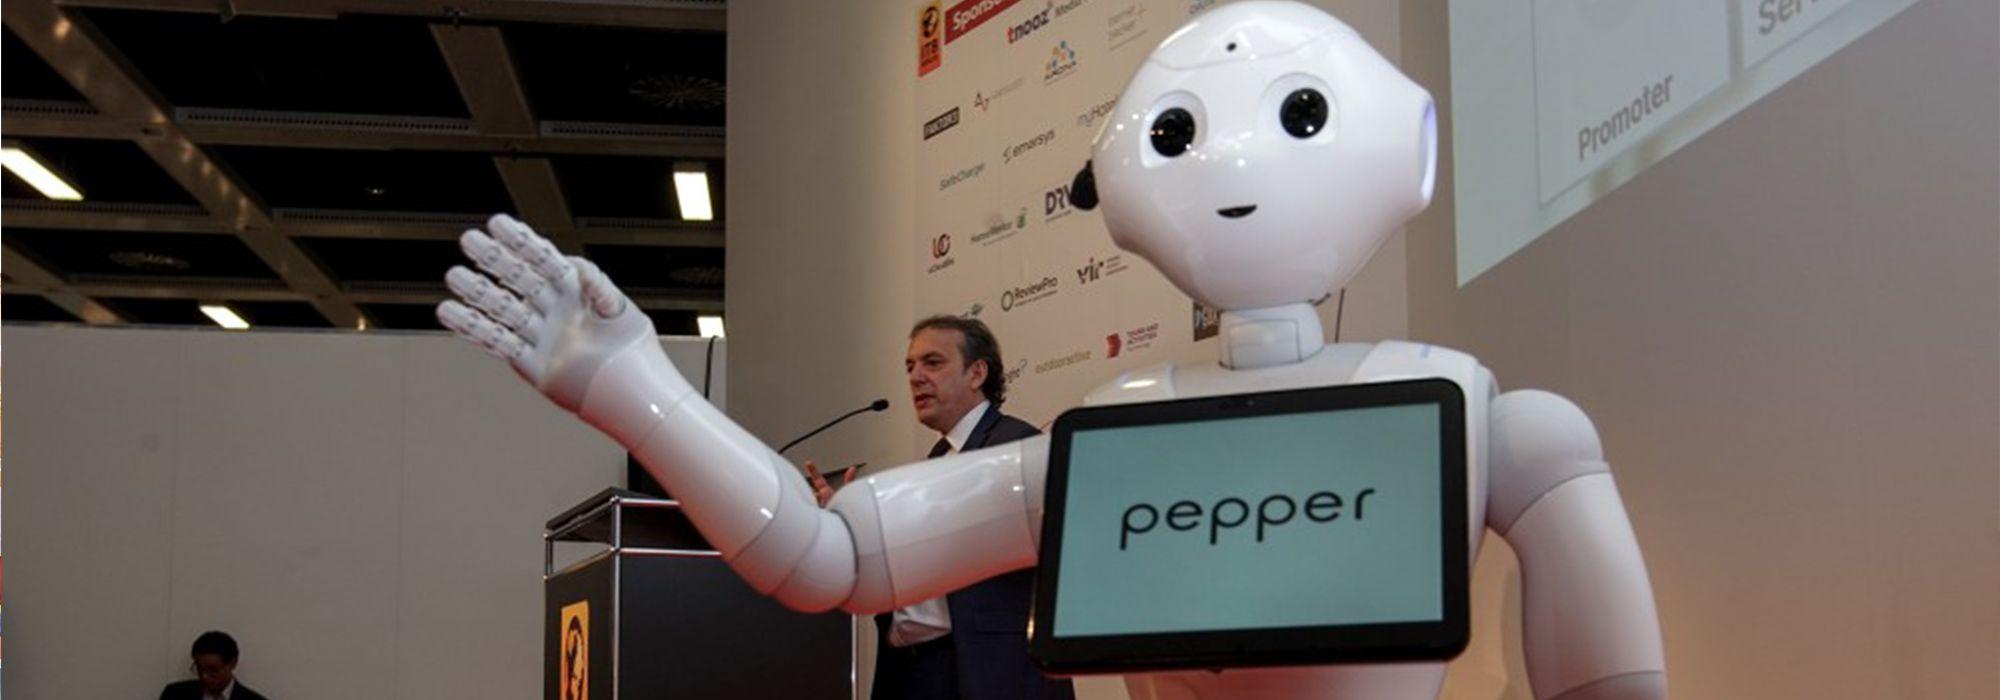 AI Technology - Servicebot Pepper